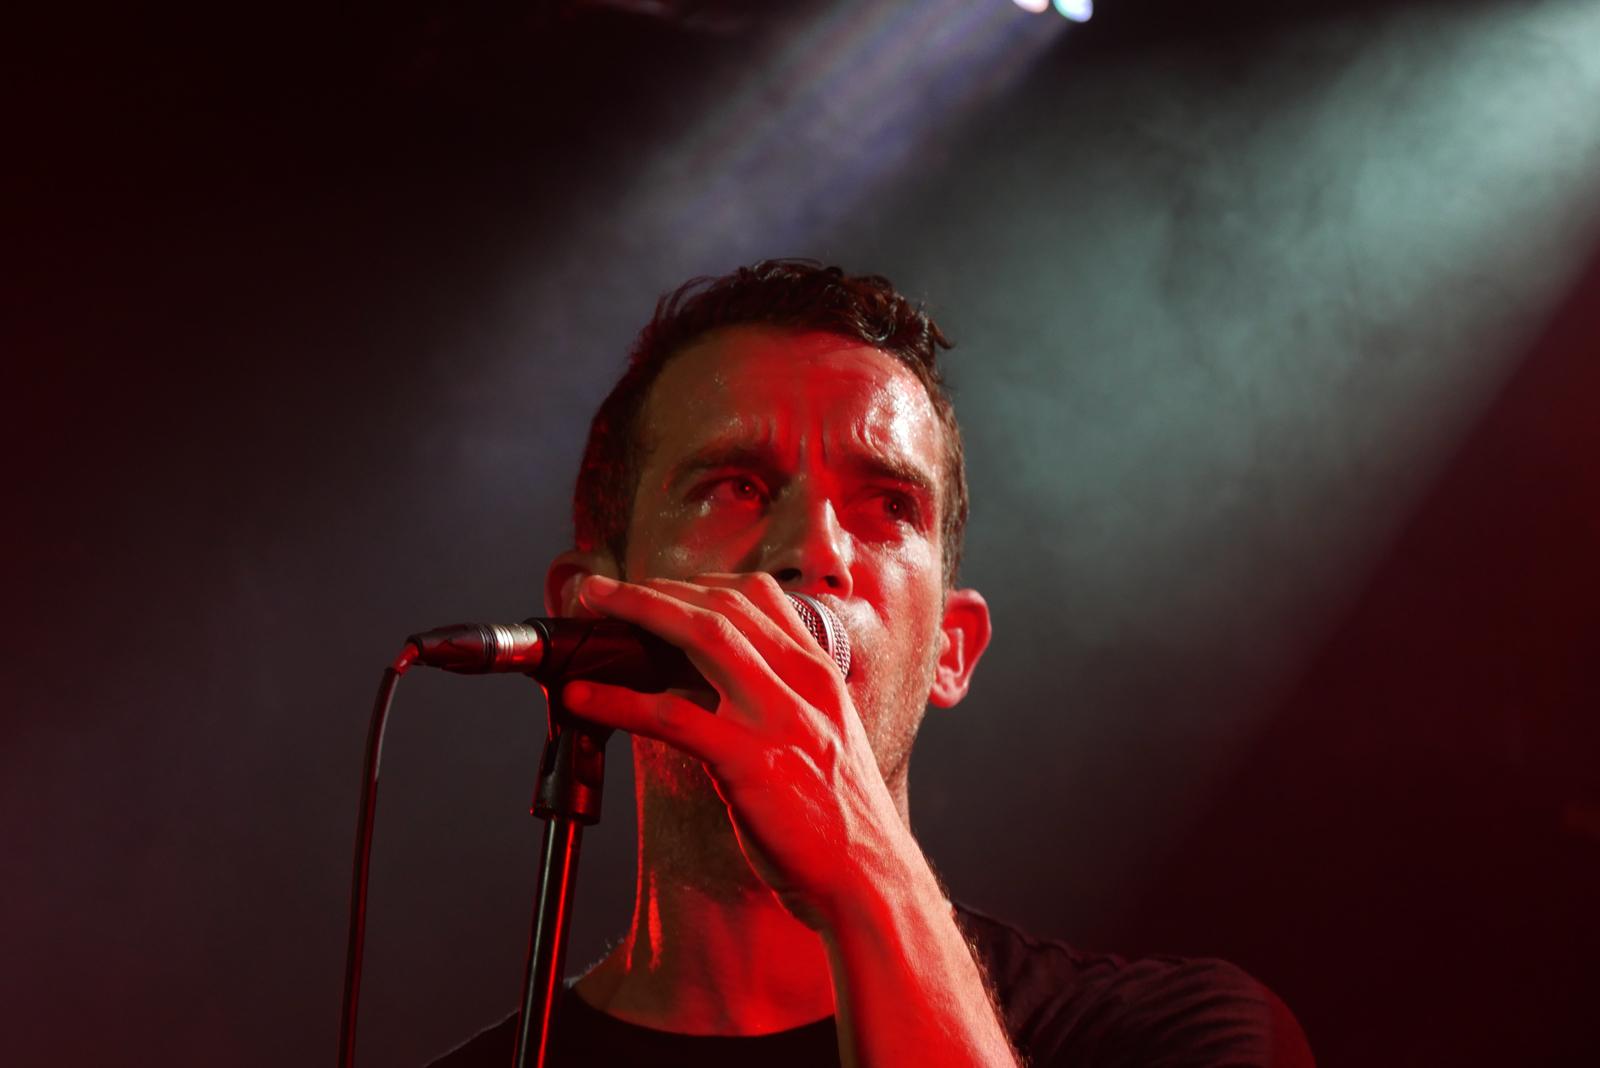 marvin-jouno-live-interieur-nuit-concert-mama-2106-festival-paris-photo-usofparis-blog